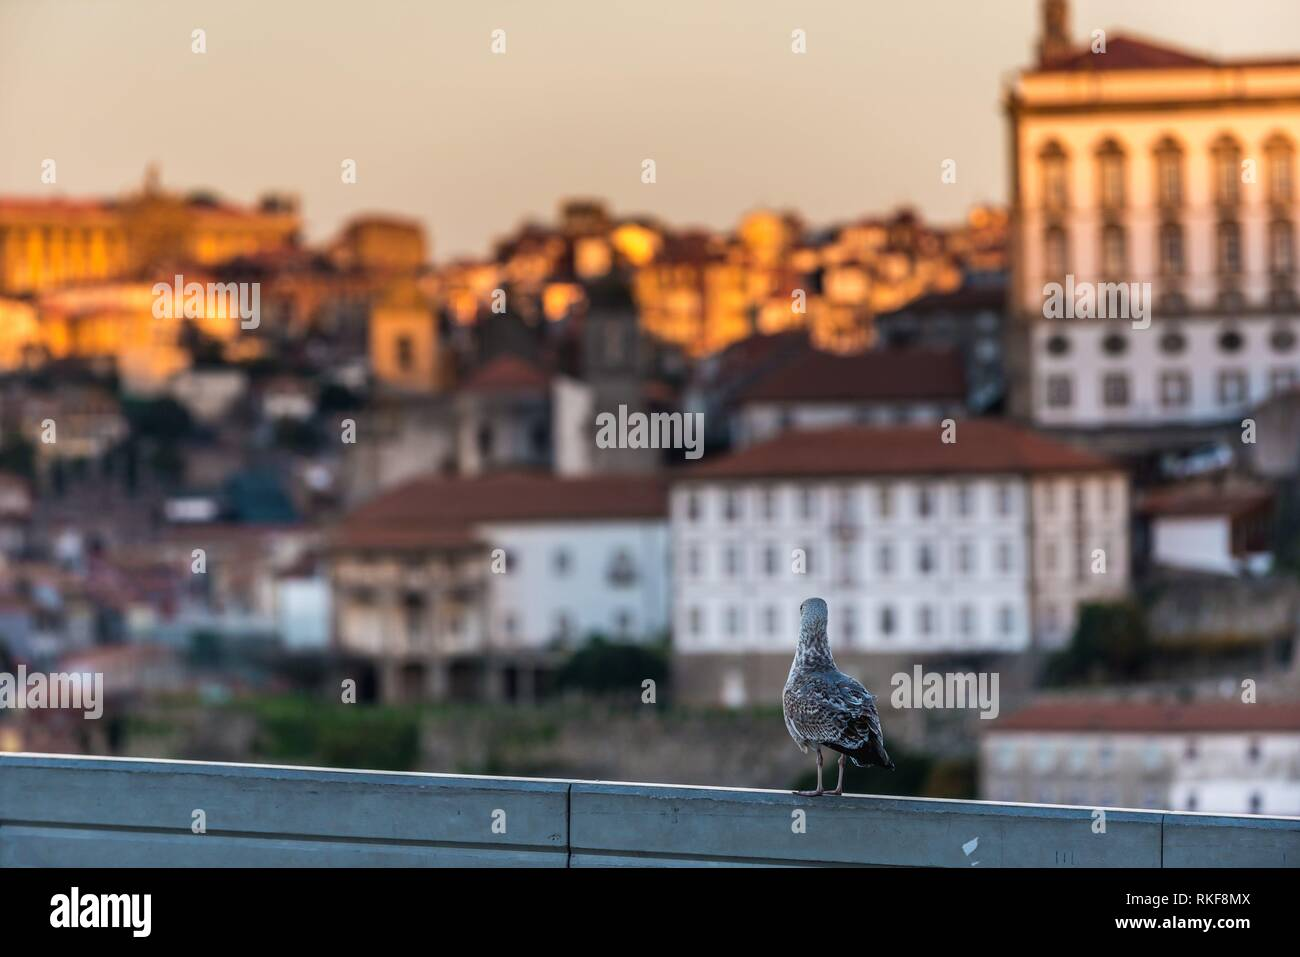 Seagull on a fence in Vila Nova de Gaia City. Porto city buildings on background. - Stock Image